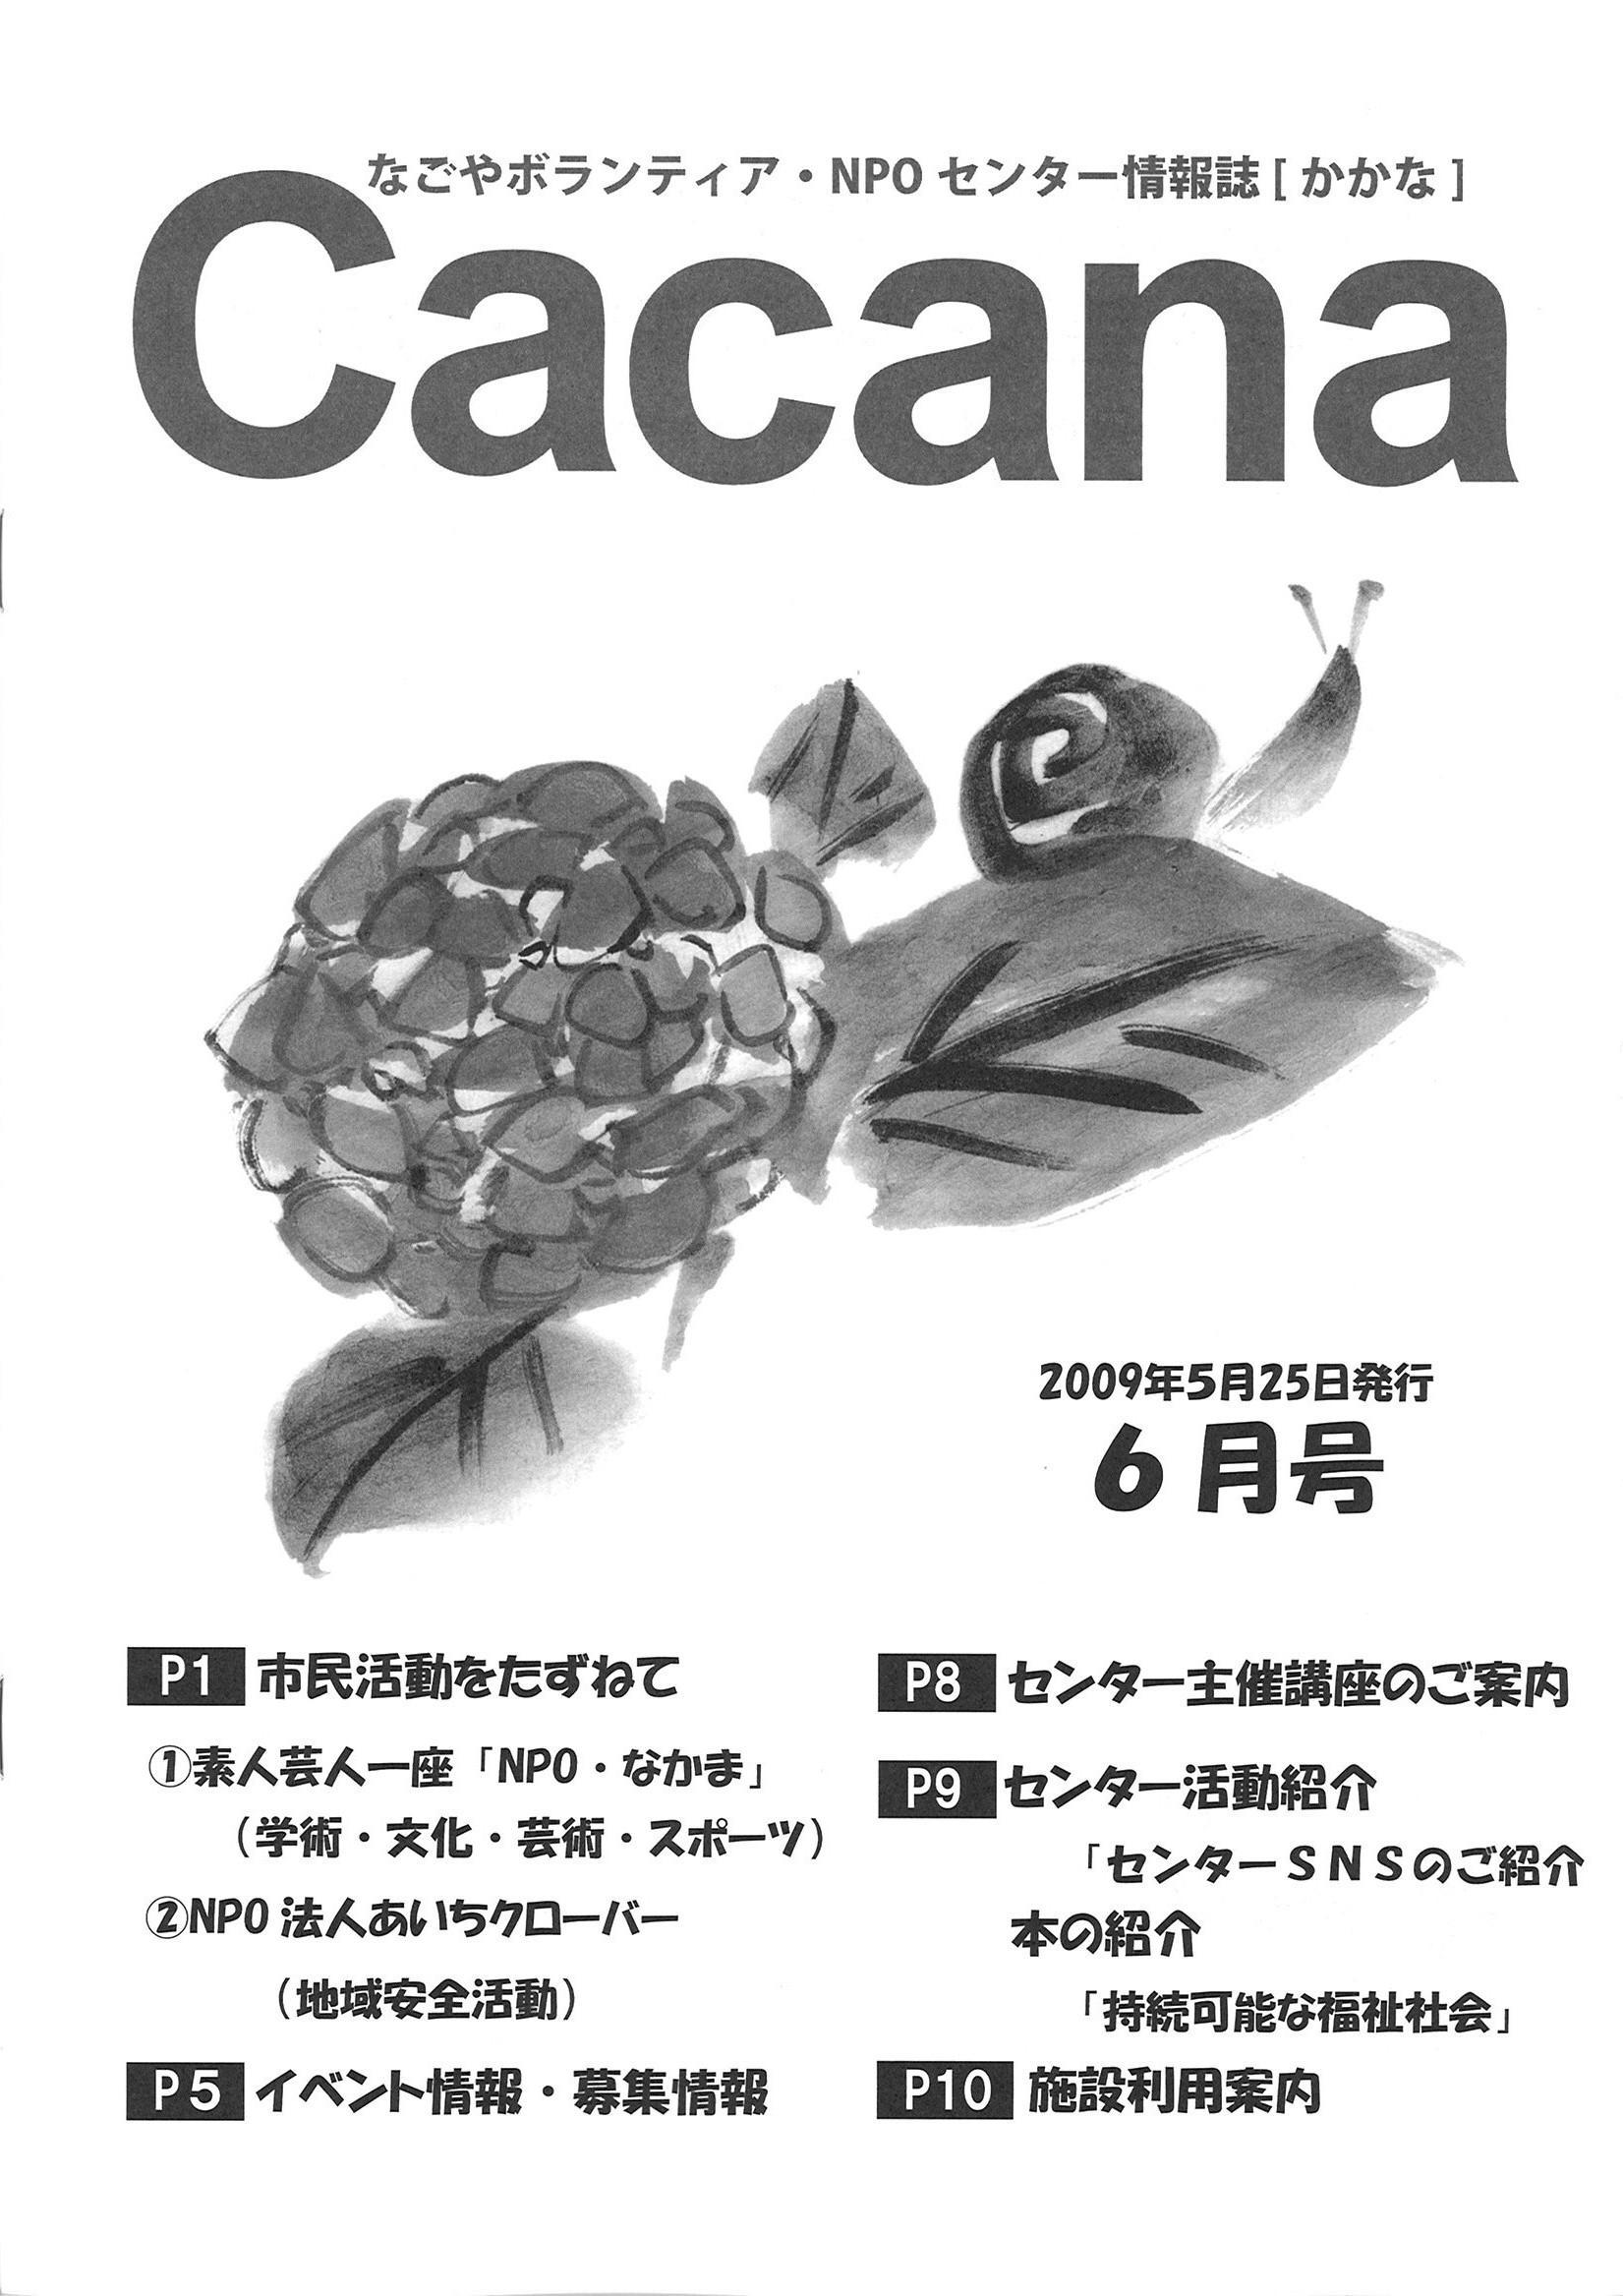 Cacana [かかな] にて紹介されました。_b0146633_1650610.jpg